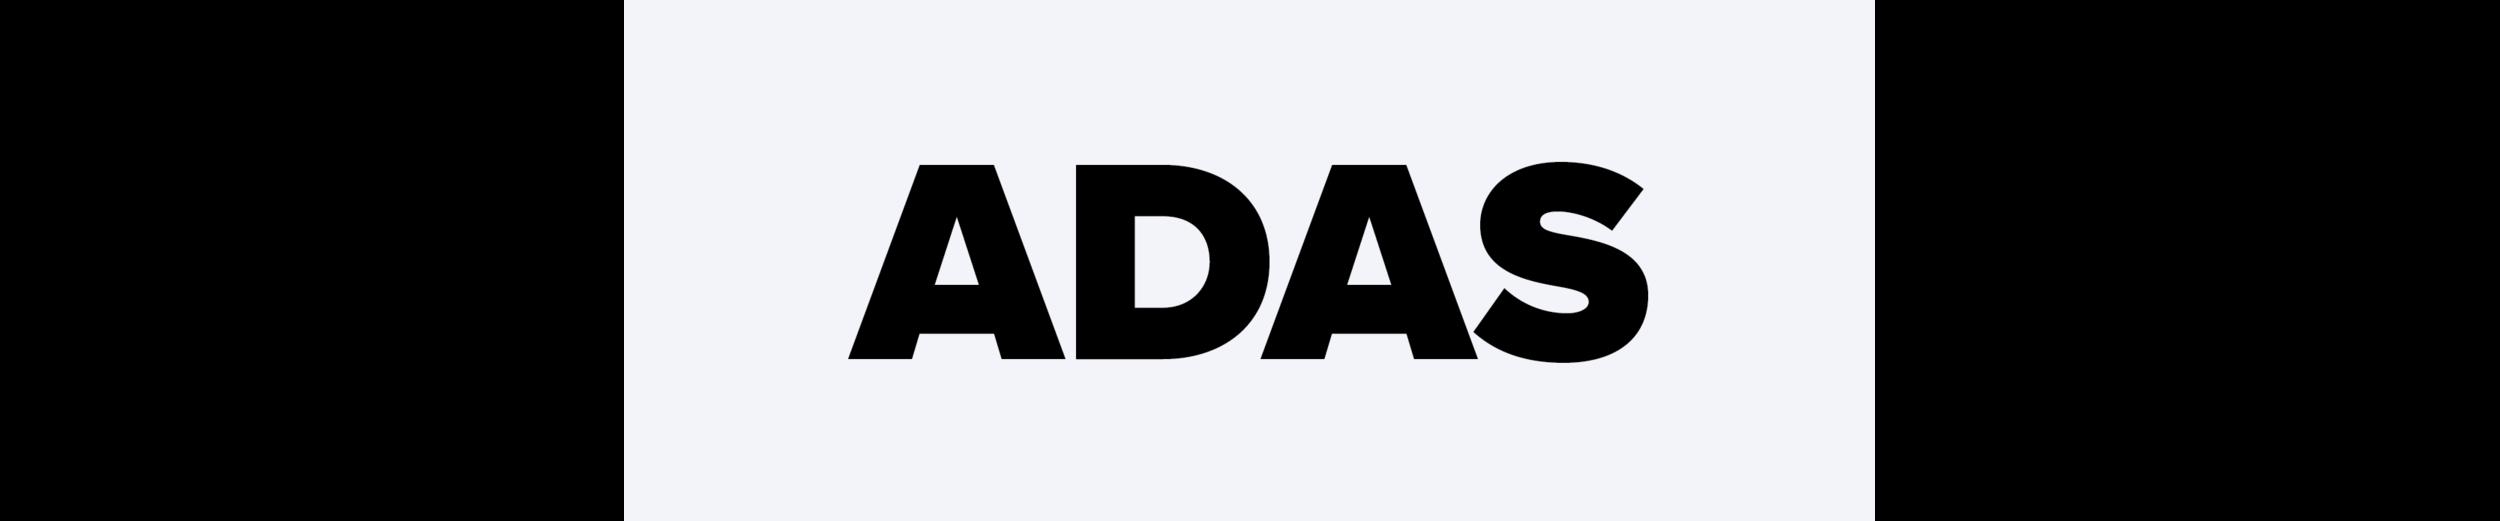 ADAS Title-01.png